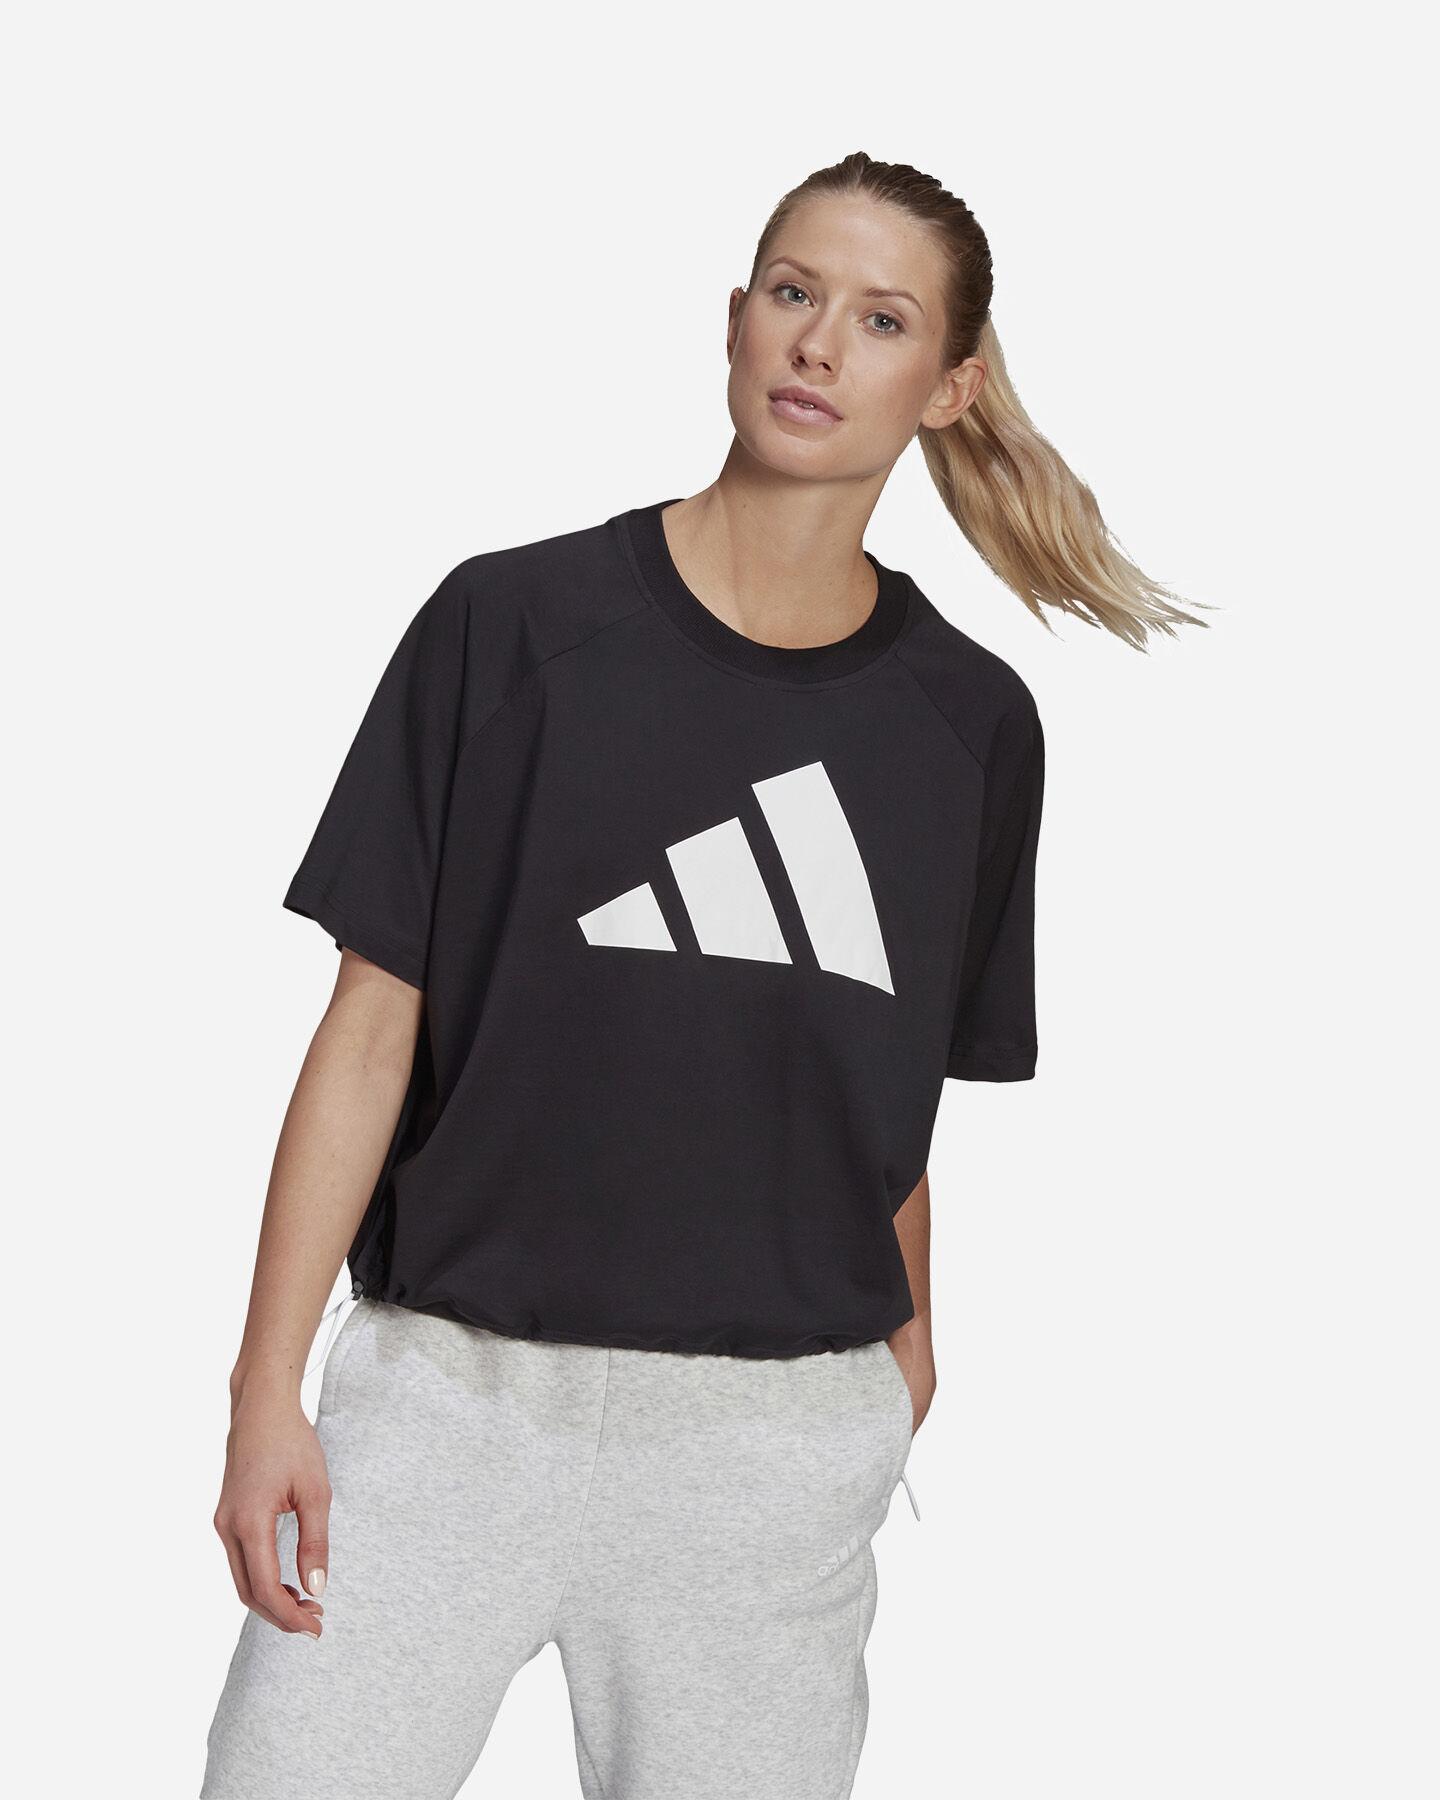 T-Shirt ADIDAS LOGO W S5275229 scatto 1